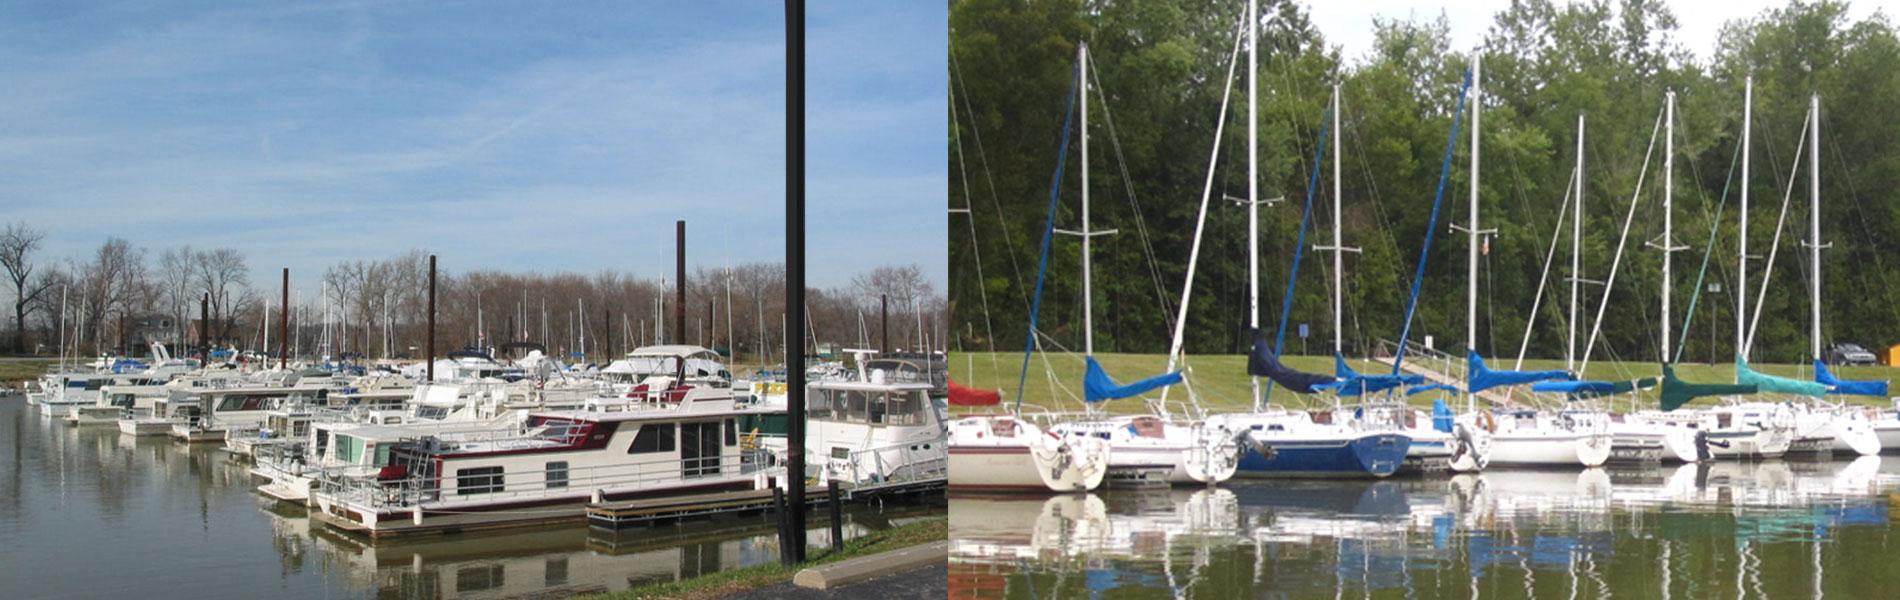 limestone bay yacht club – a full service marina